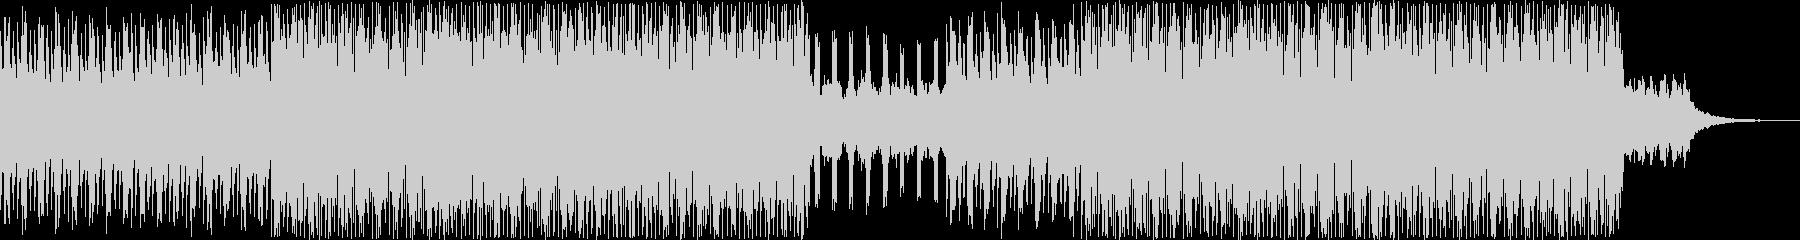 VPなどの映像用BGMに(MP3)の未再生の波形